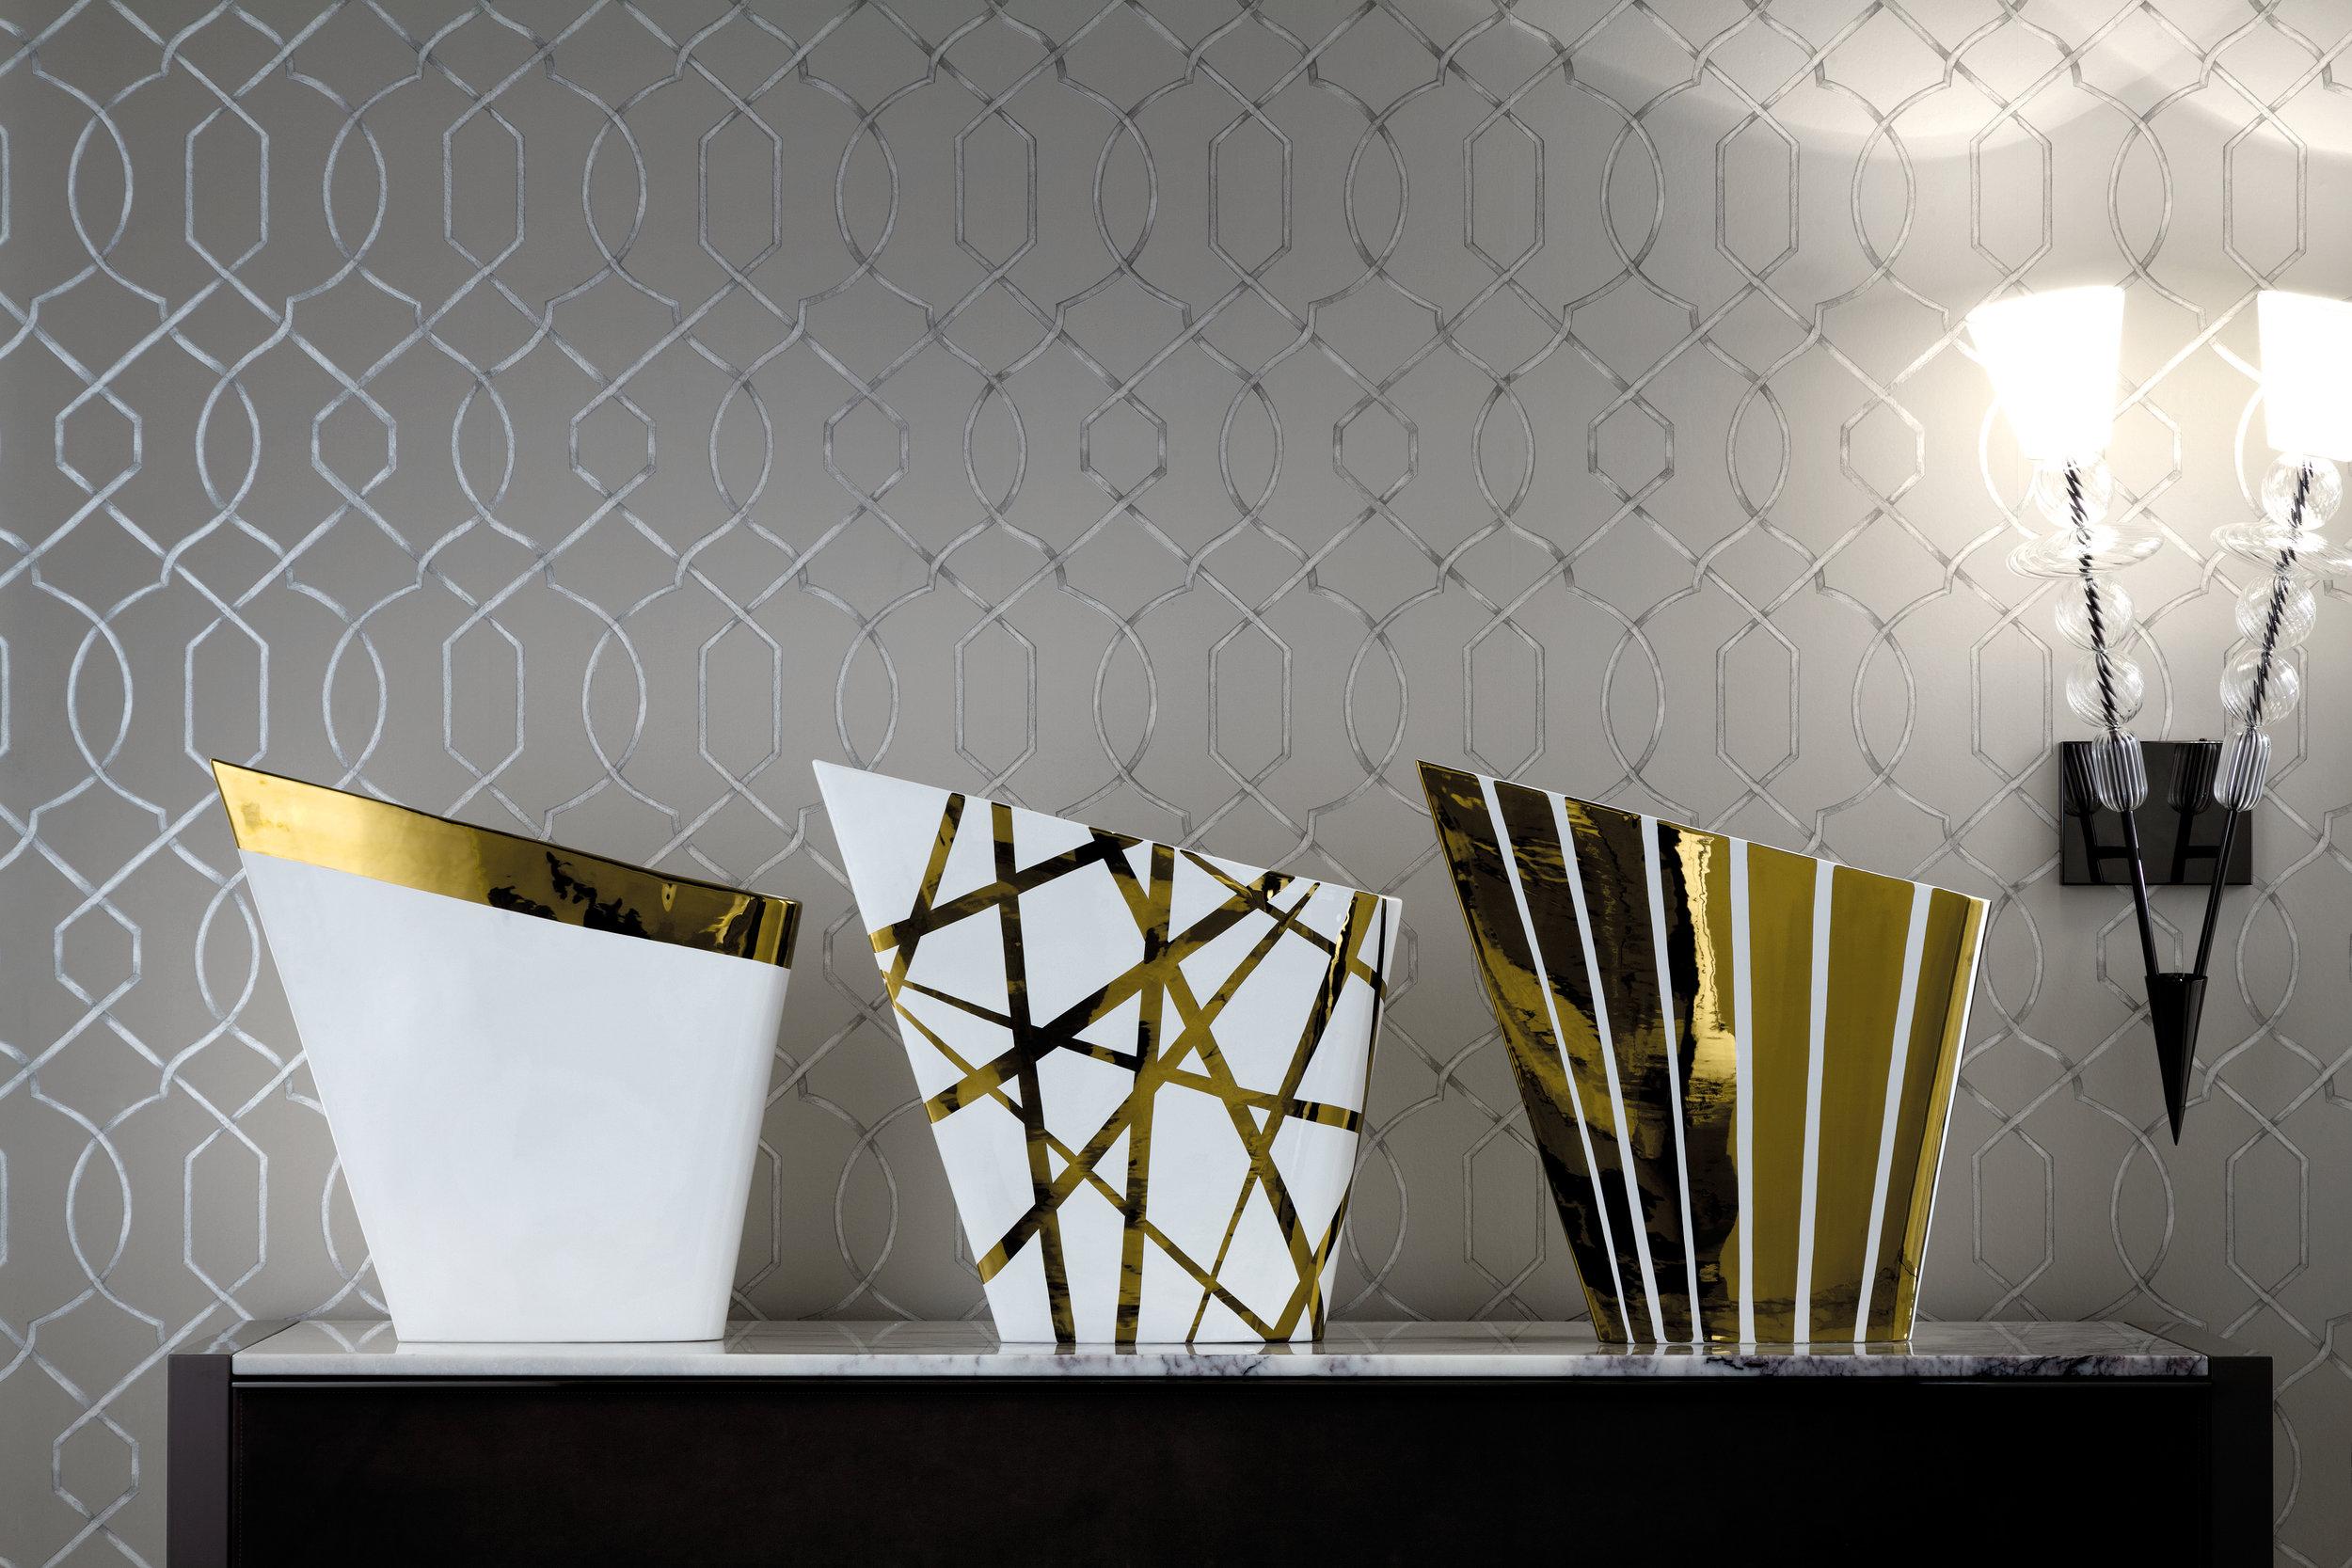 GC_Vision_Accessories_Teseo-Perseo-Orfeo Vases_01.jpg